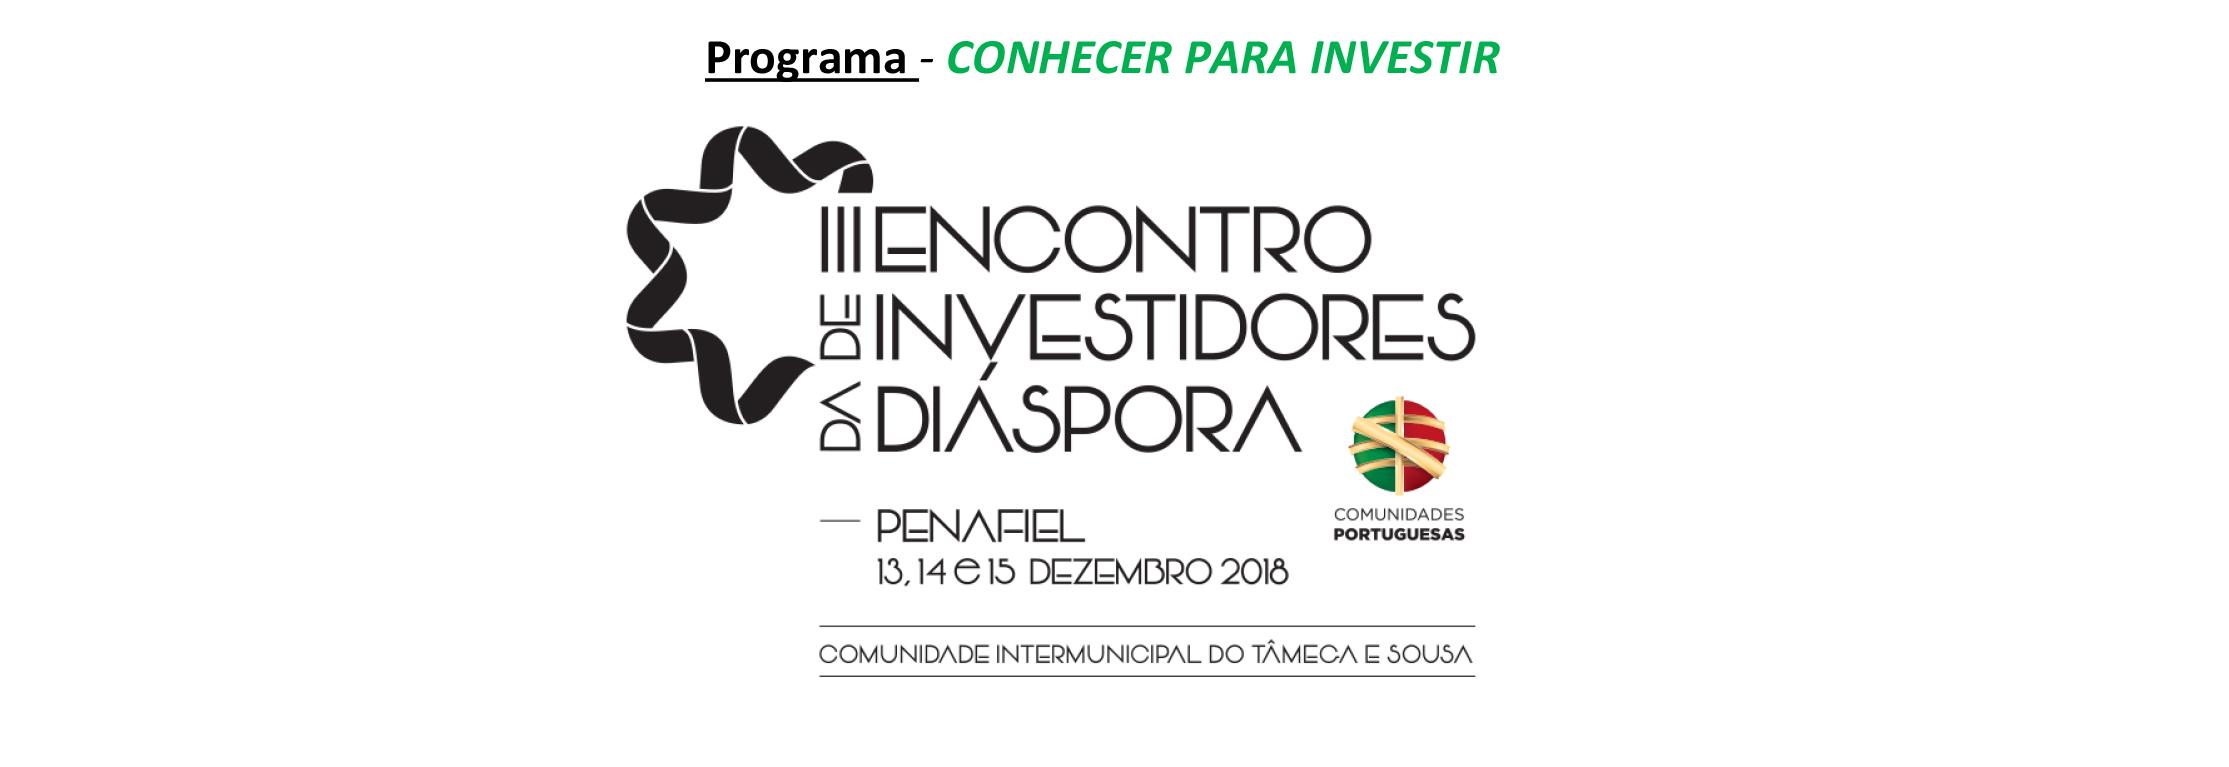 Programa III Encontro de Investidores da Diáspora 1 1